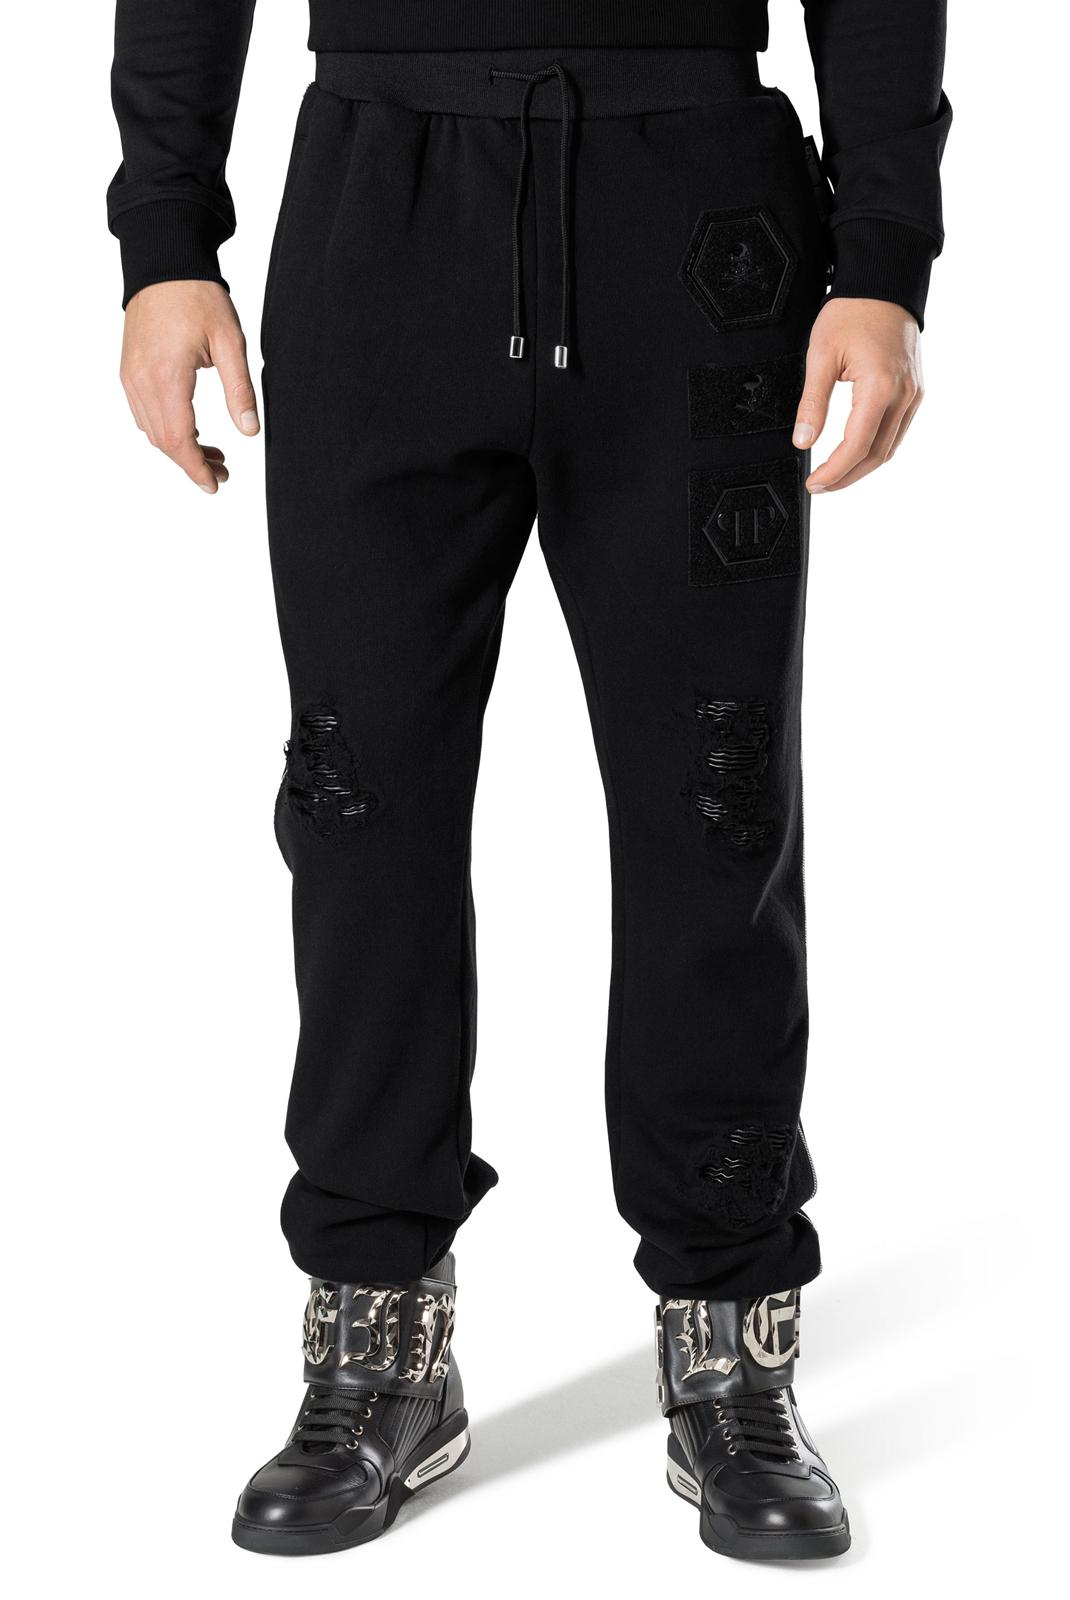 Pantalons sport/streetwear  Philipp plein MJT0360 BLACK